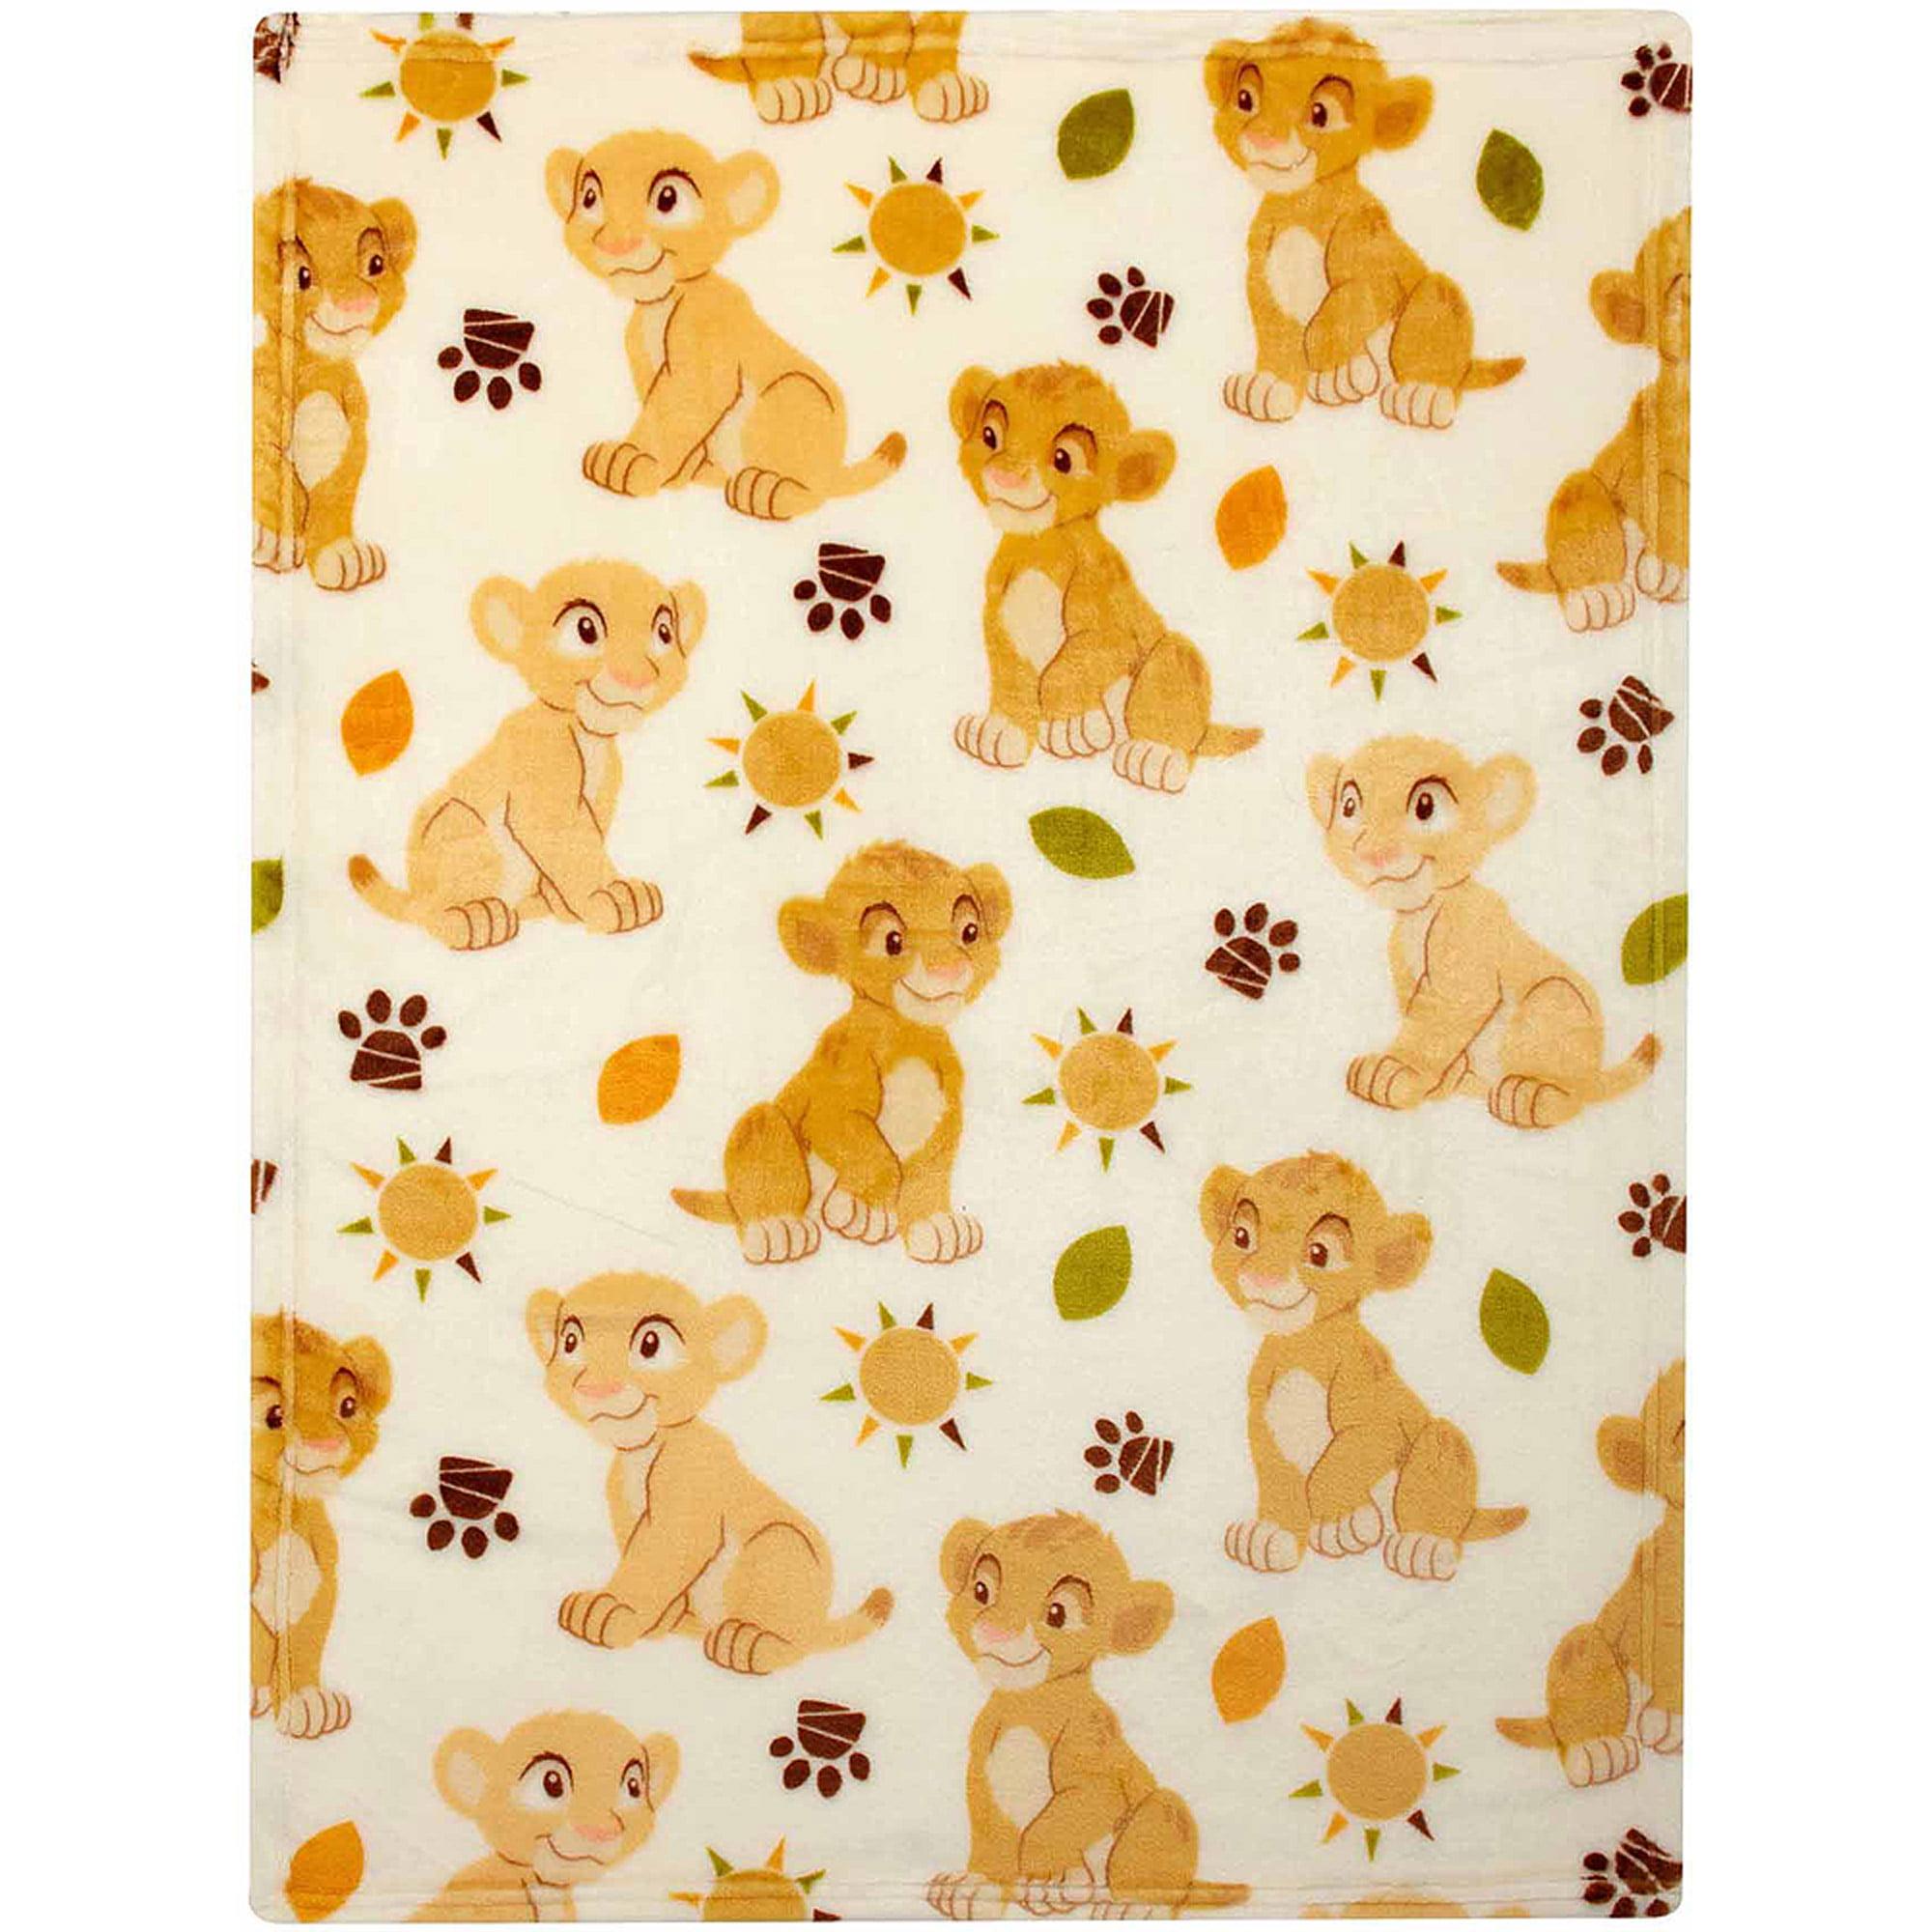 Disney Lion King Plush Printed Blanket by Disney